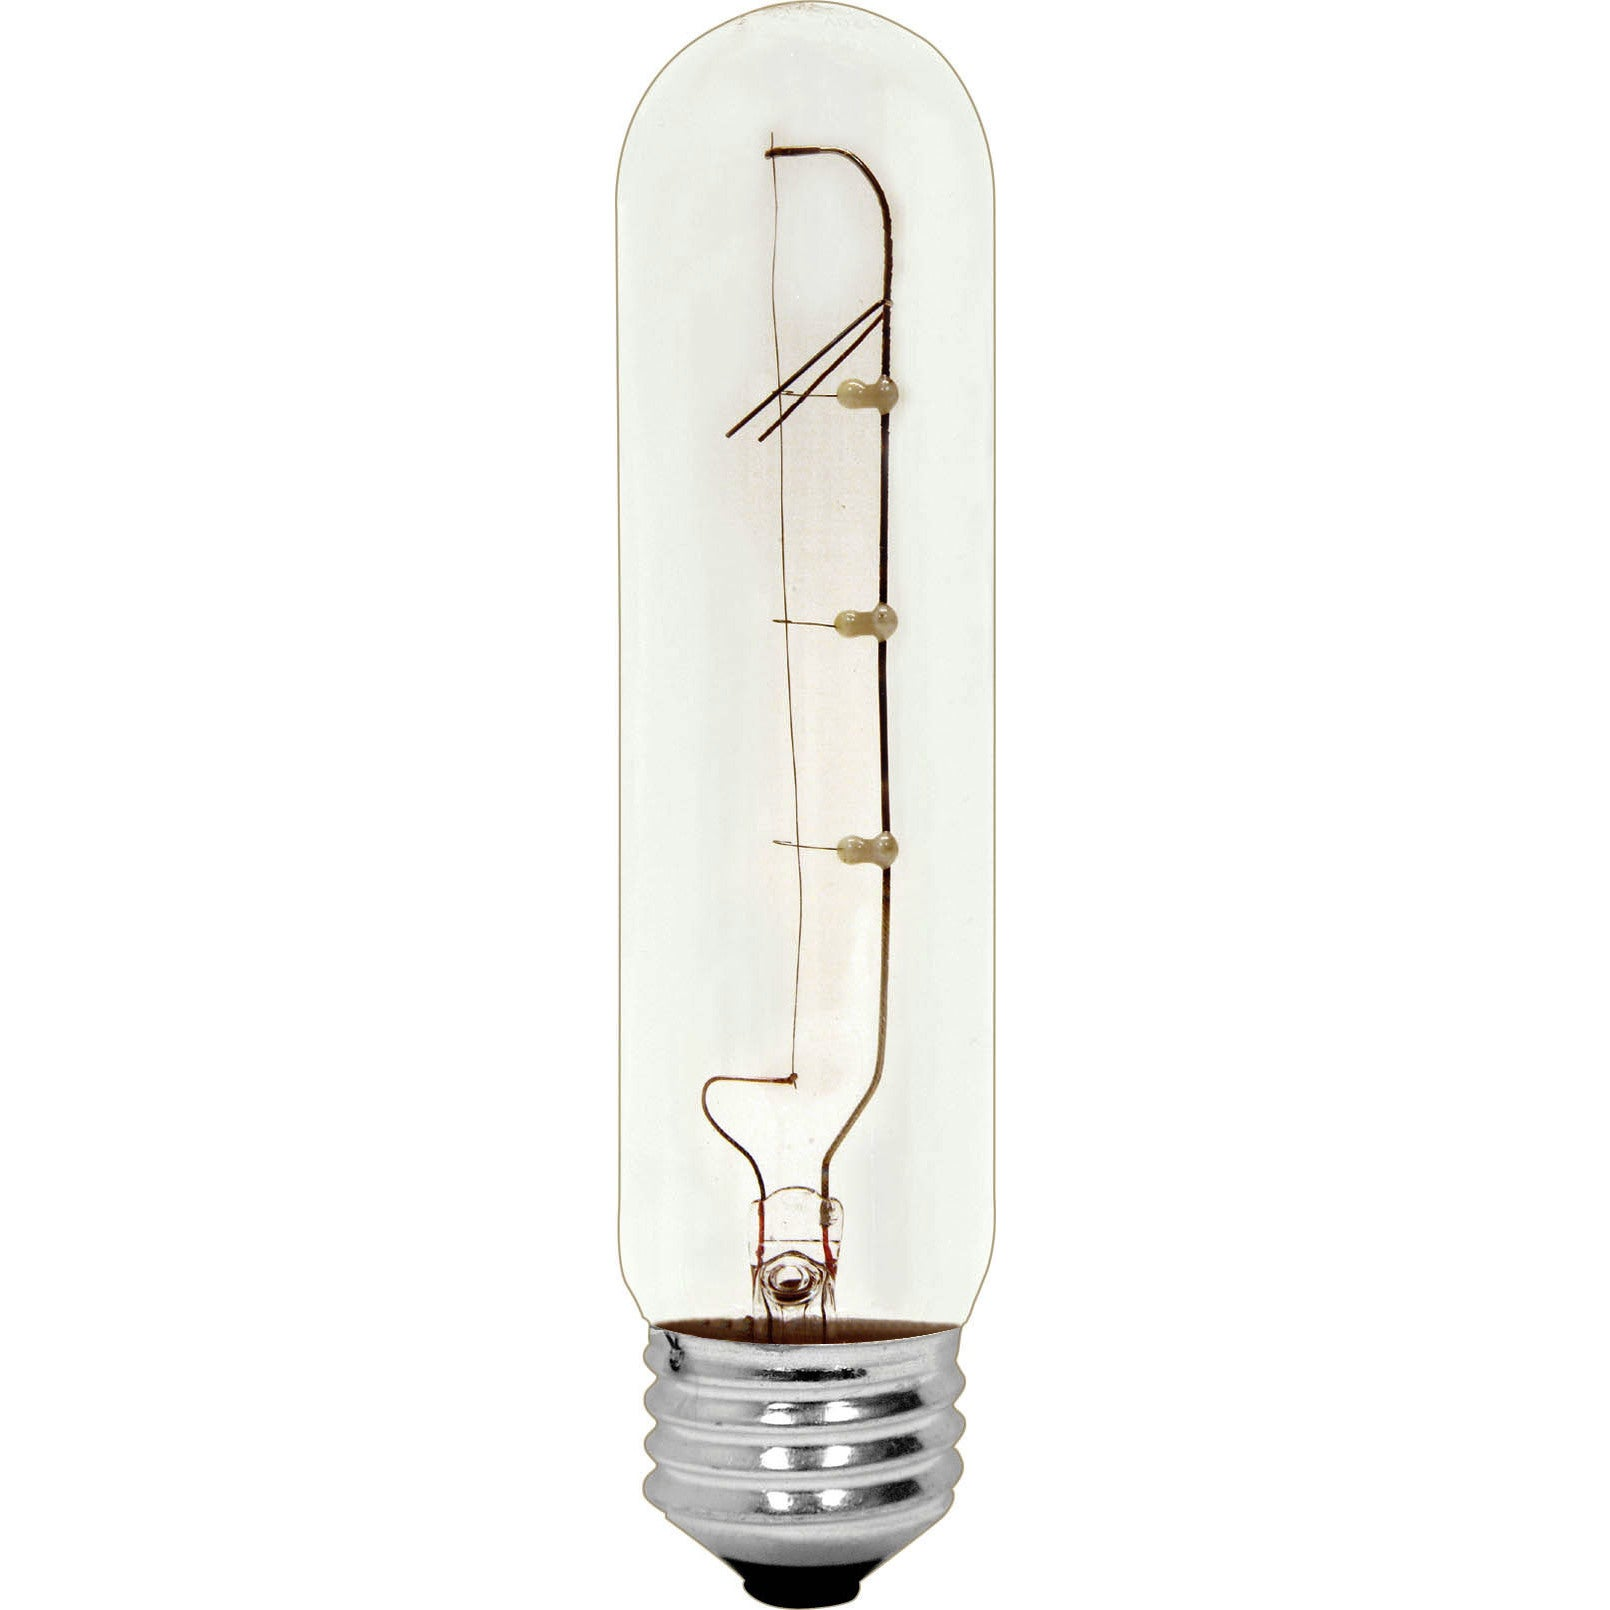 GE Incandescent Light Bulb 40 watts 420 lumens 2500 K Tub...